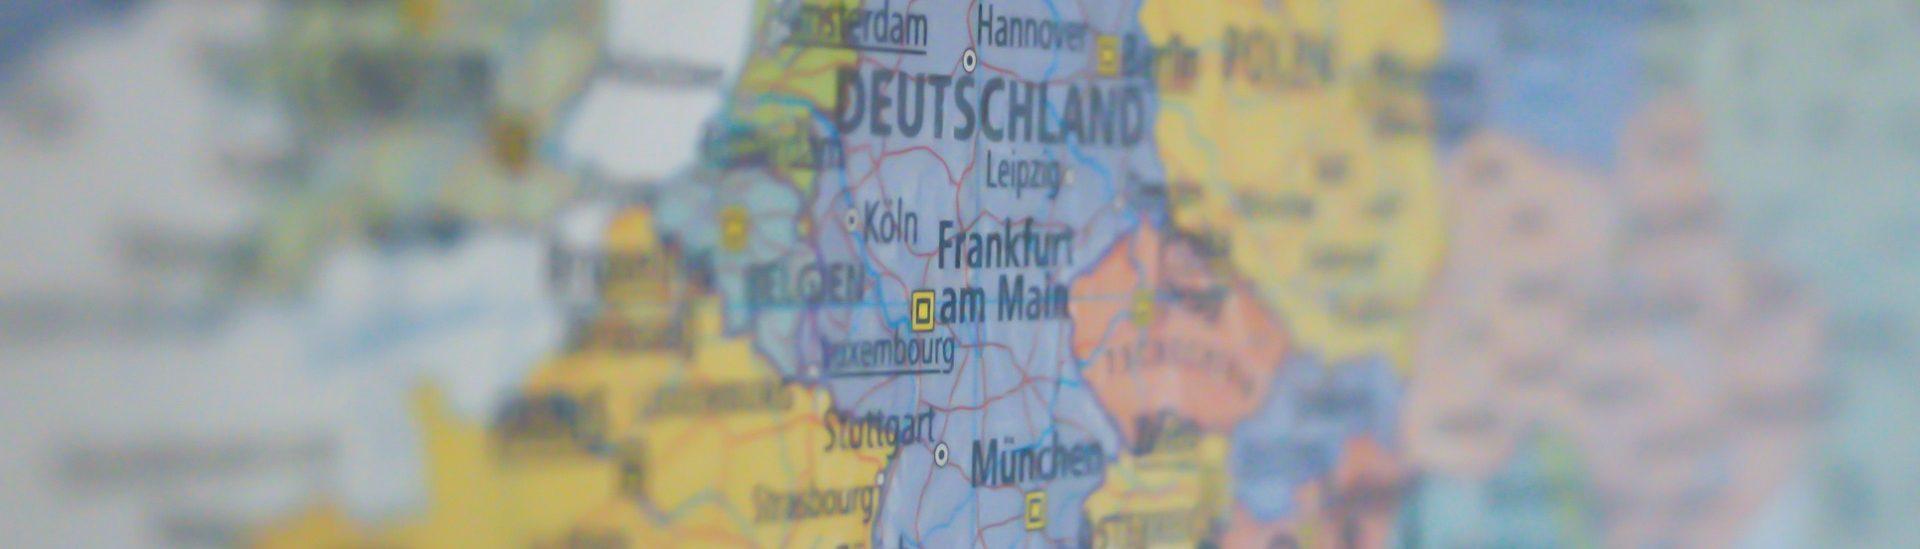 German Affair